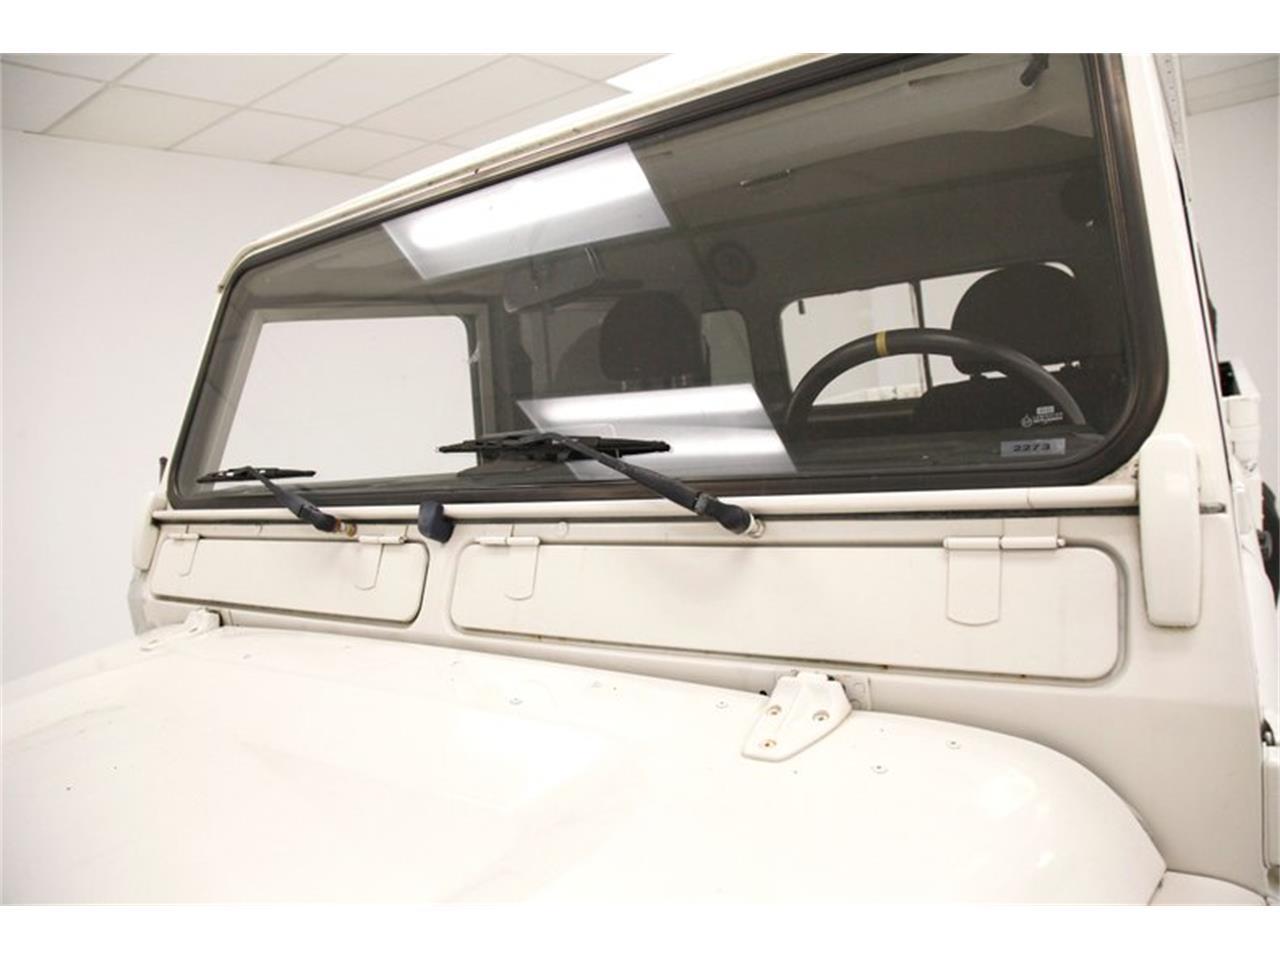 1993 Land Rover Defender (CC-1392696) for sale in Morgantown, Pennsylvania